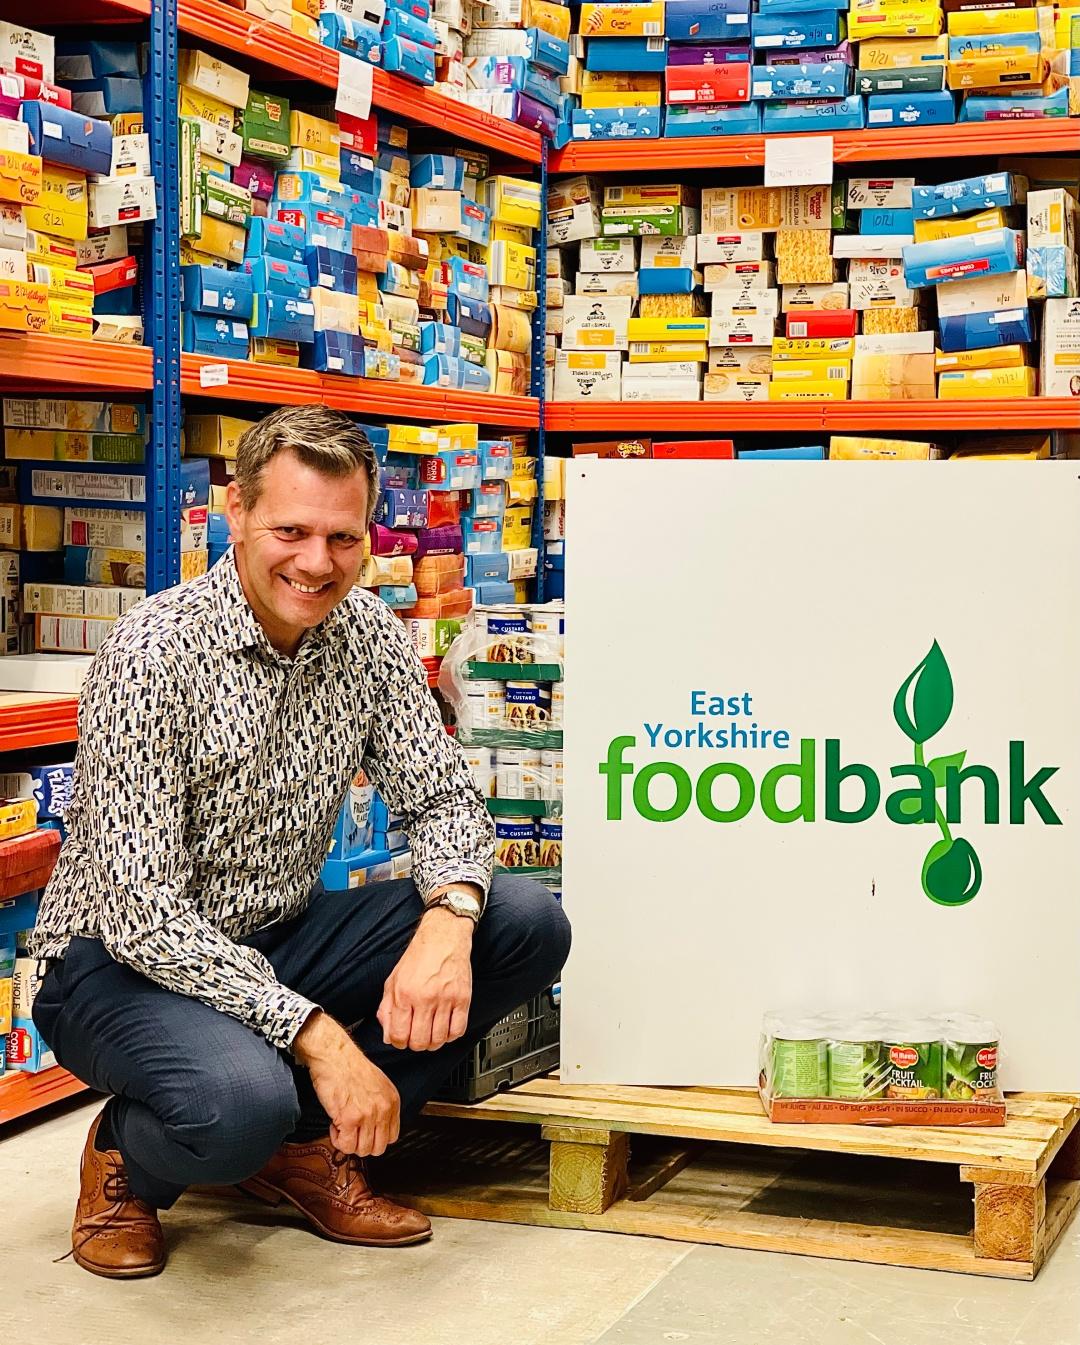 David Bird, Trustee, East Yorkshire Foodbank